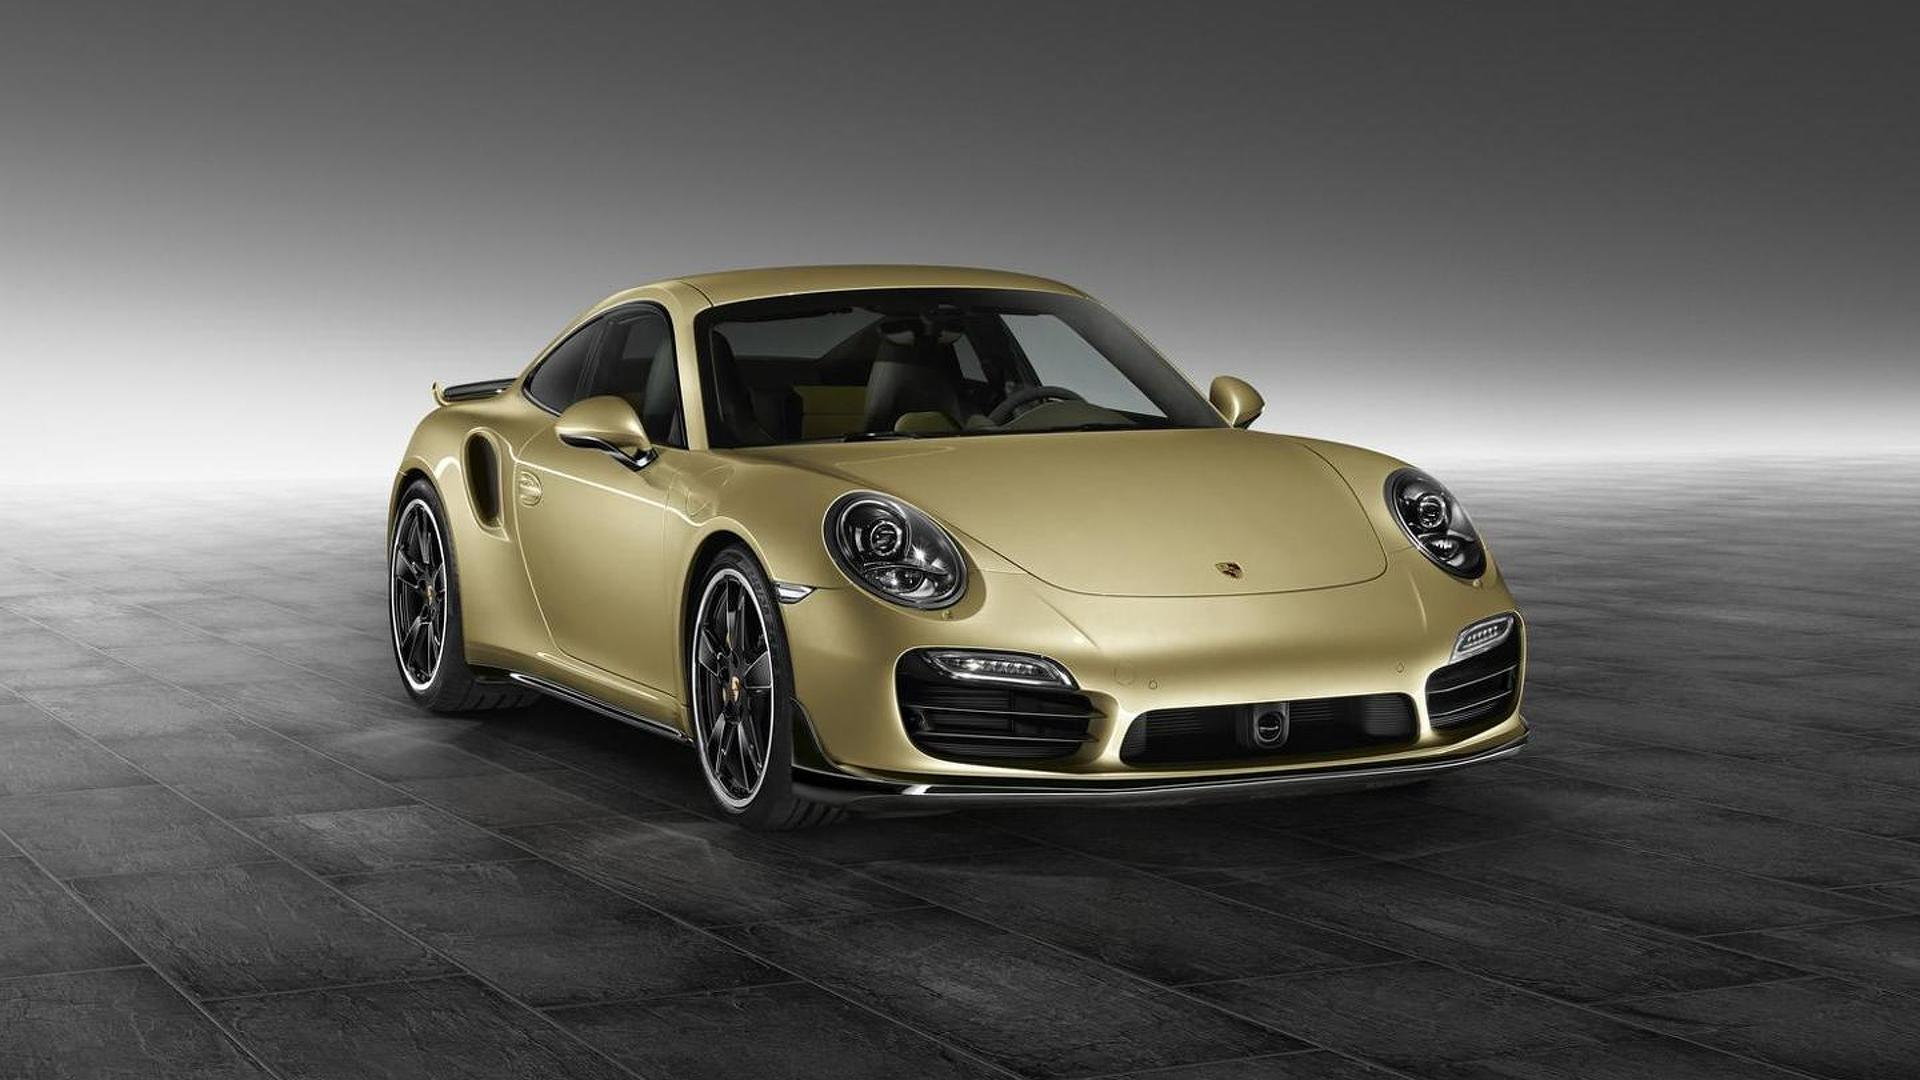 Золотистая Porsche 911 Turbo от Porsche Exclusive